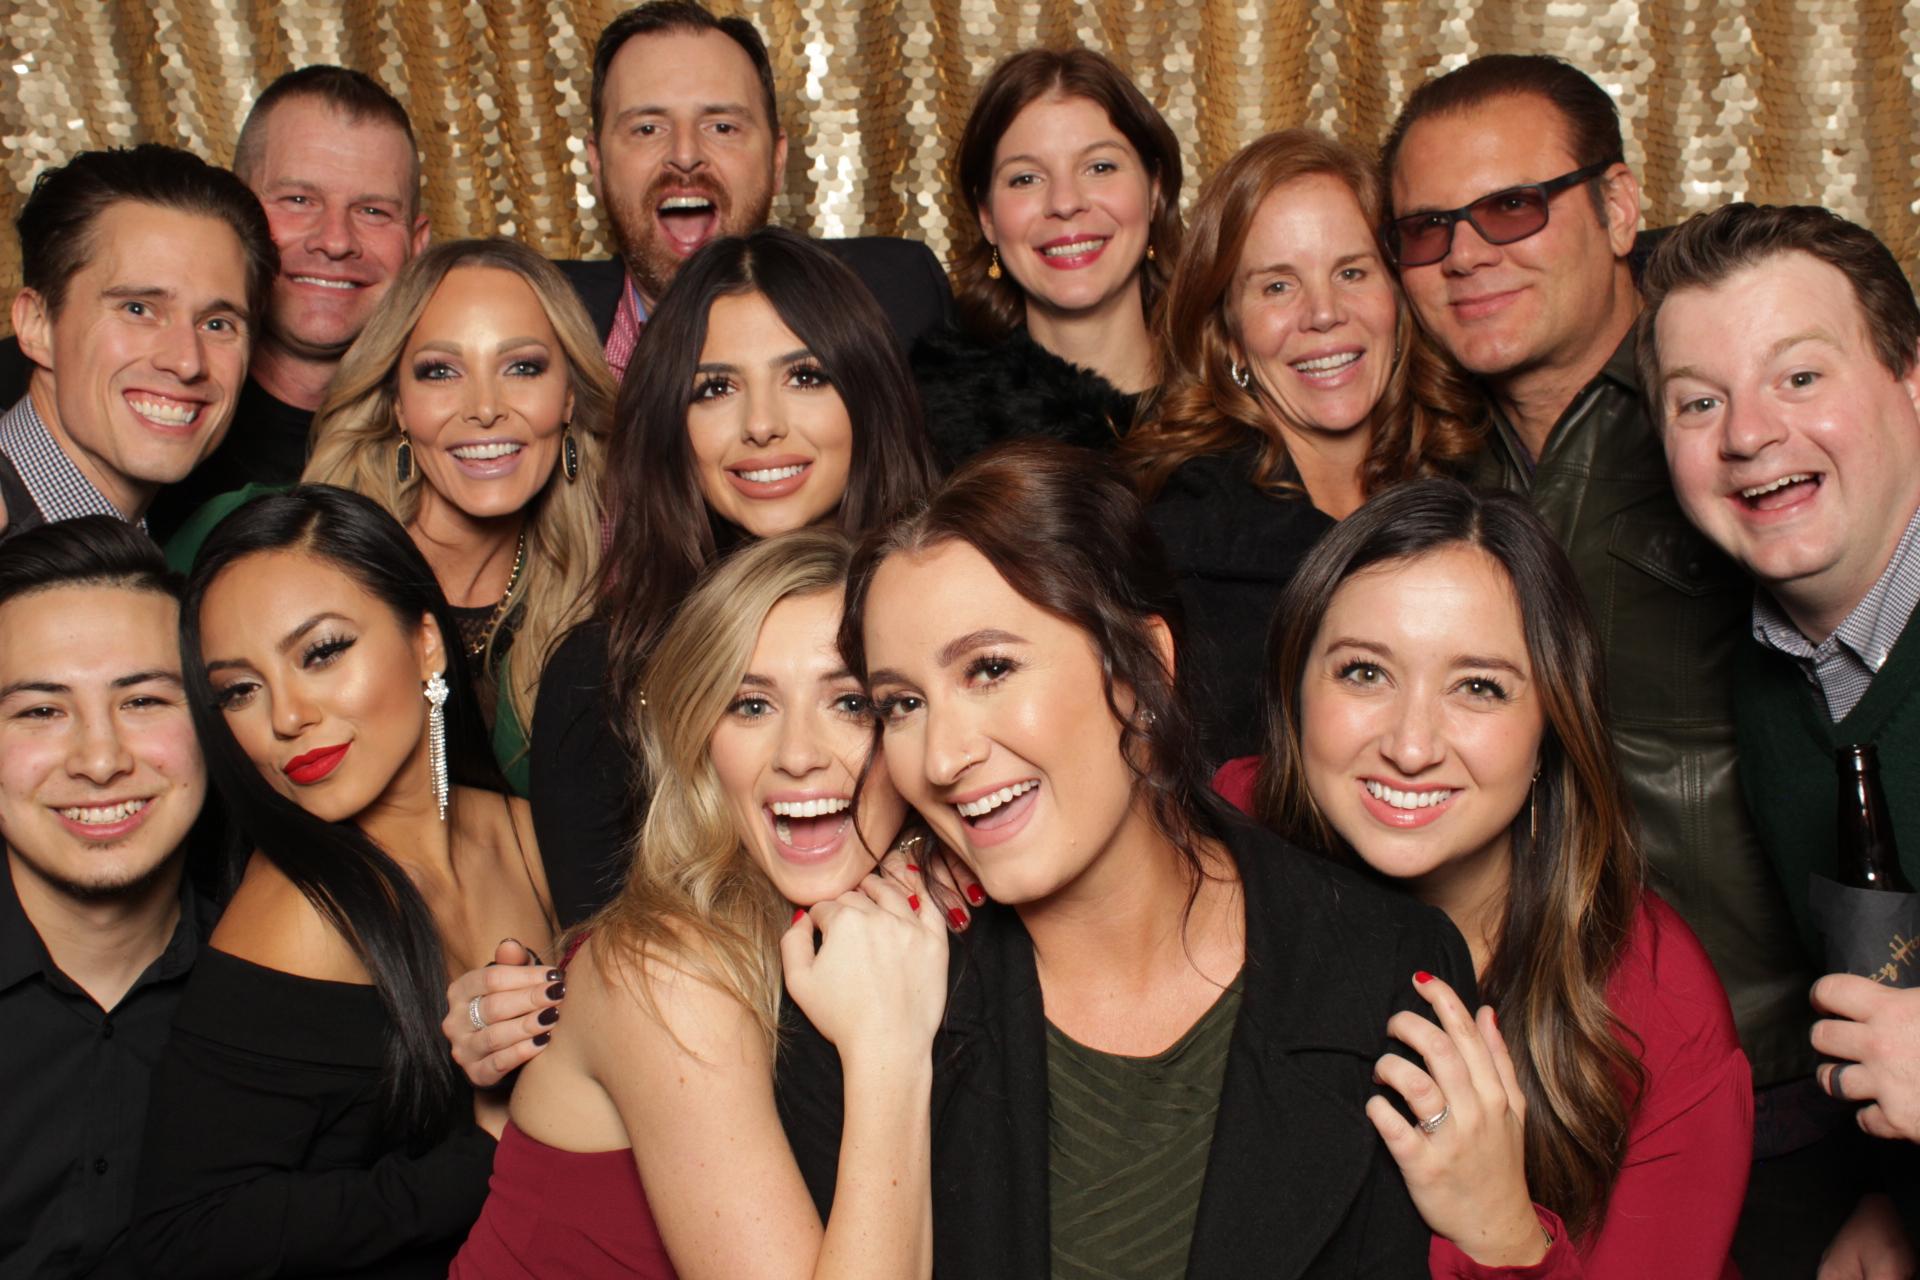 iHeartMedia Phoenix Holiday Party 2018 - Hotel Valley Ho, Scottsdale, AZ12/14/2018